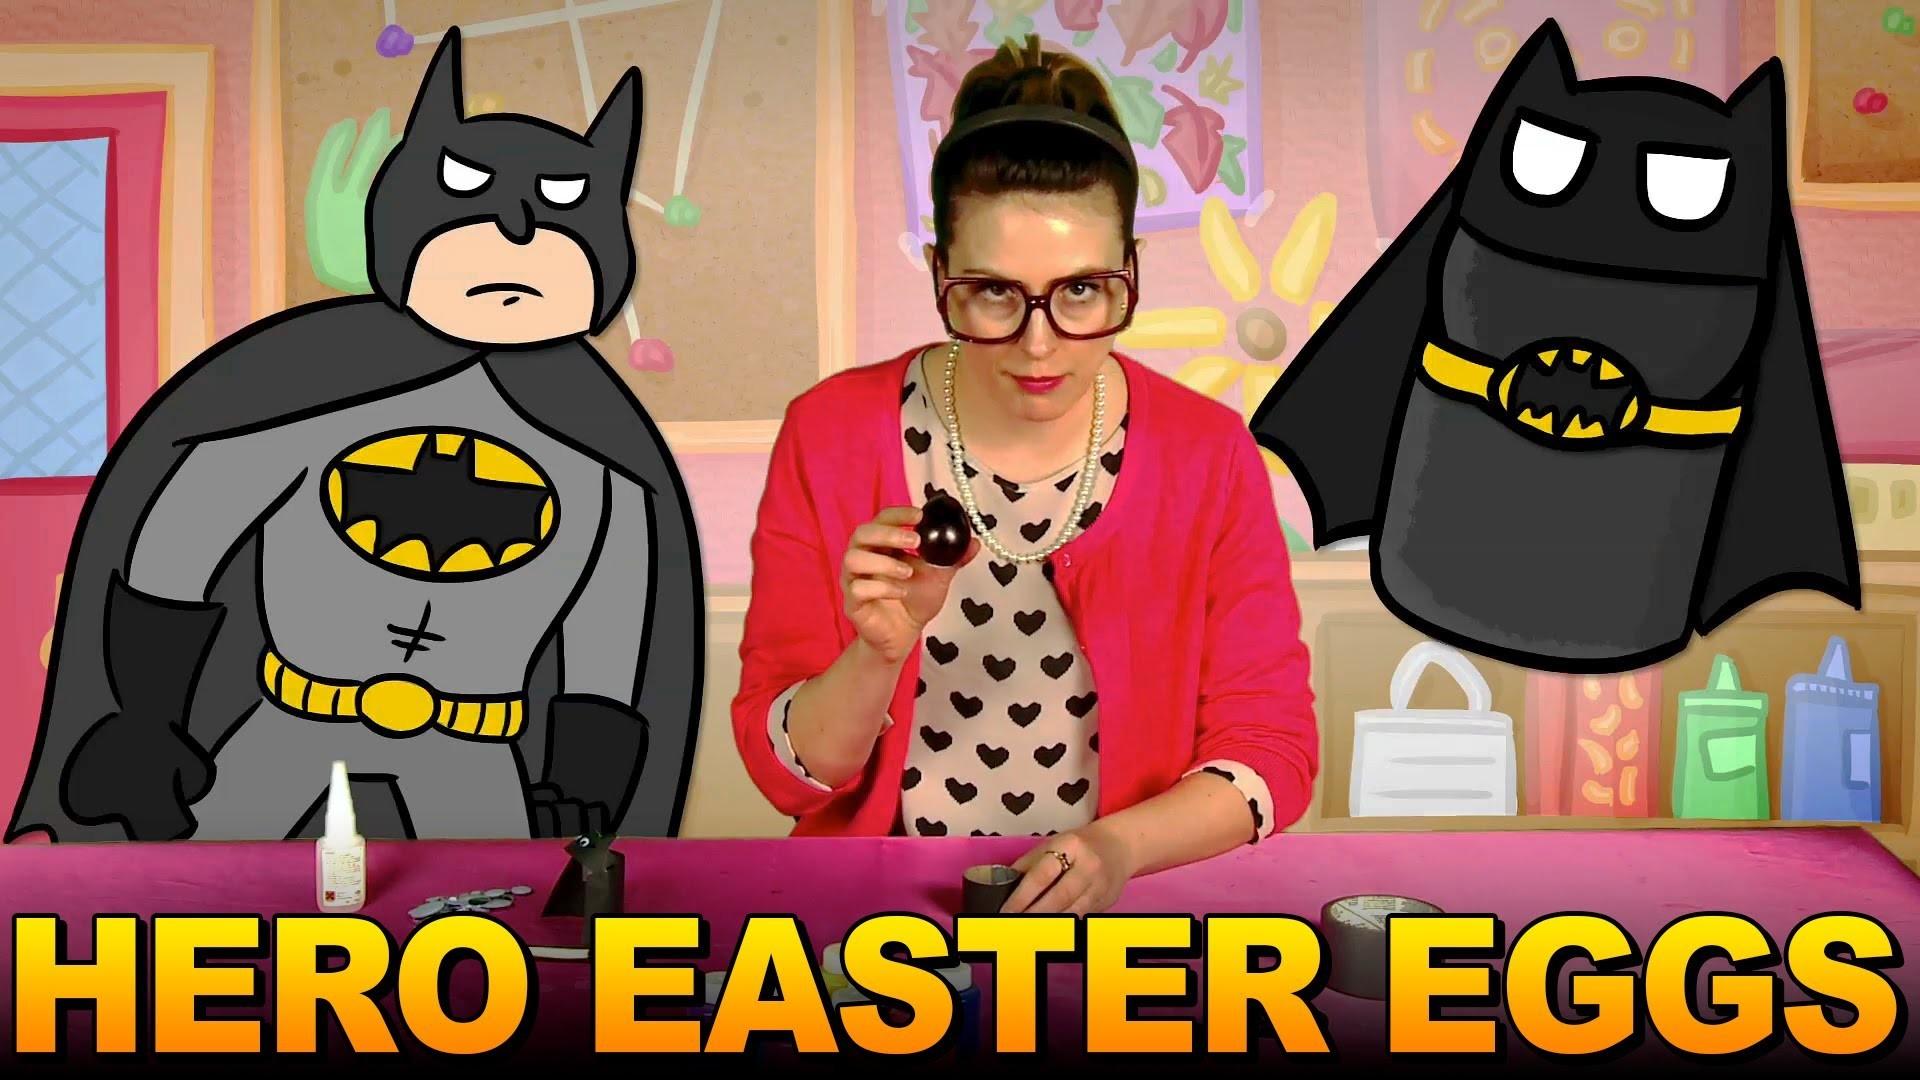 Batman Egg Craft & More Kids Crafts - Crafty Carol Compilation